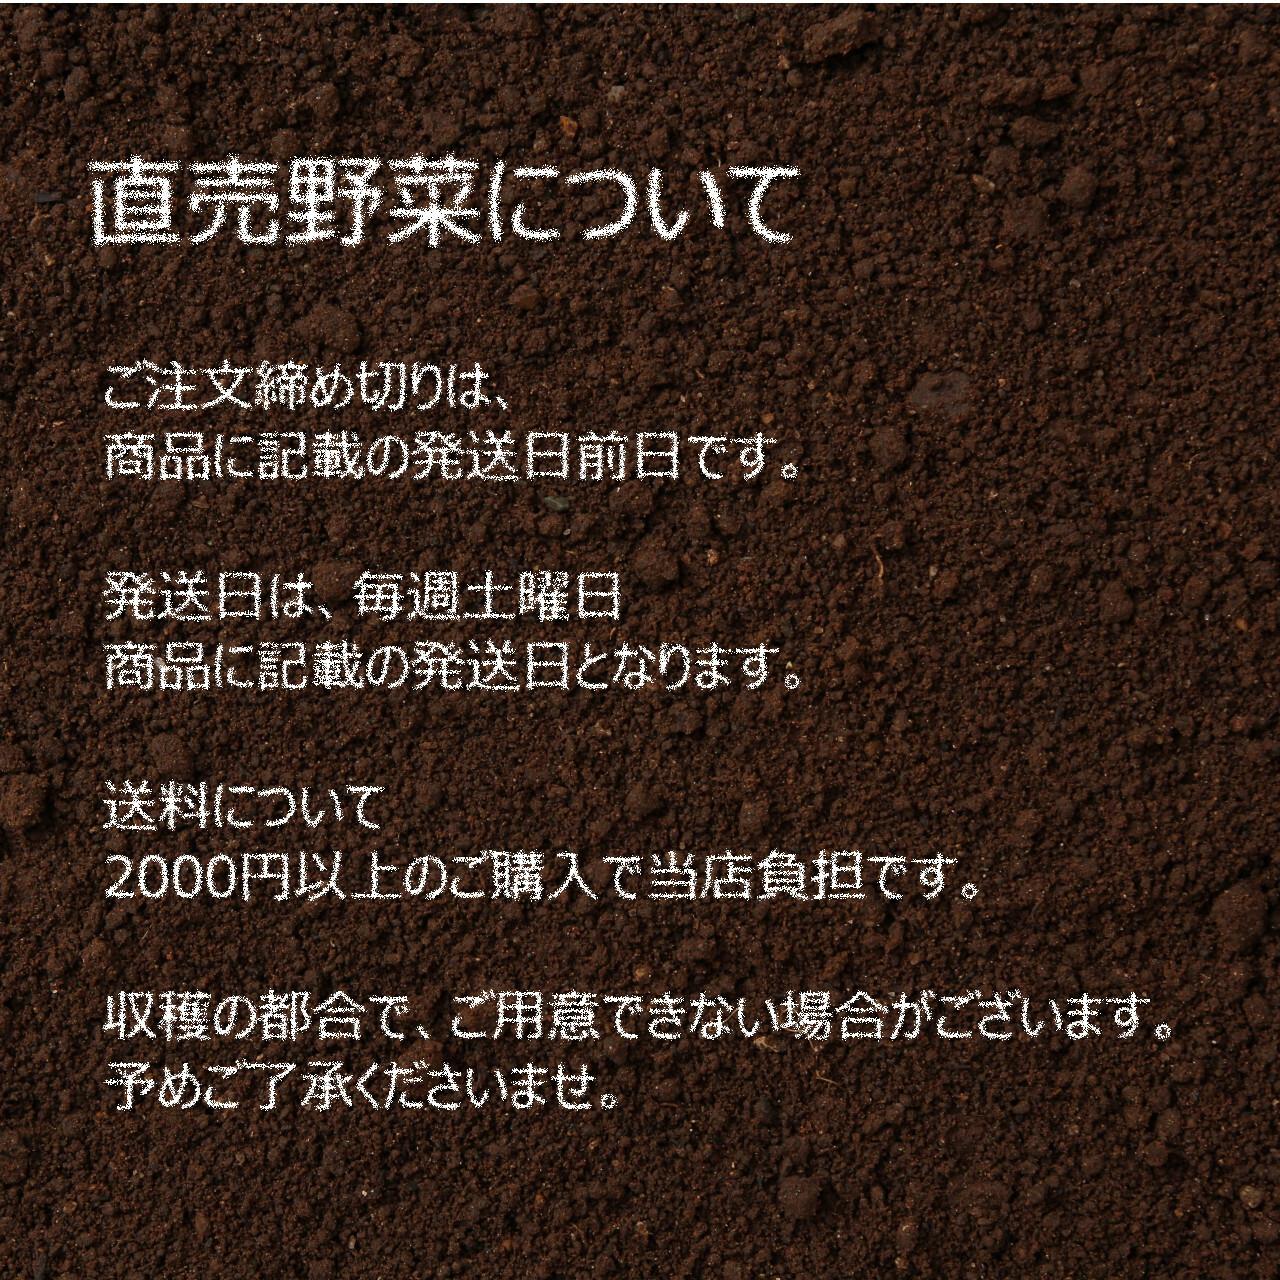 10月の朝採り直売野菜 :大根菜 約250g : 新鮮な秋野菜 10月17日発送予定